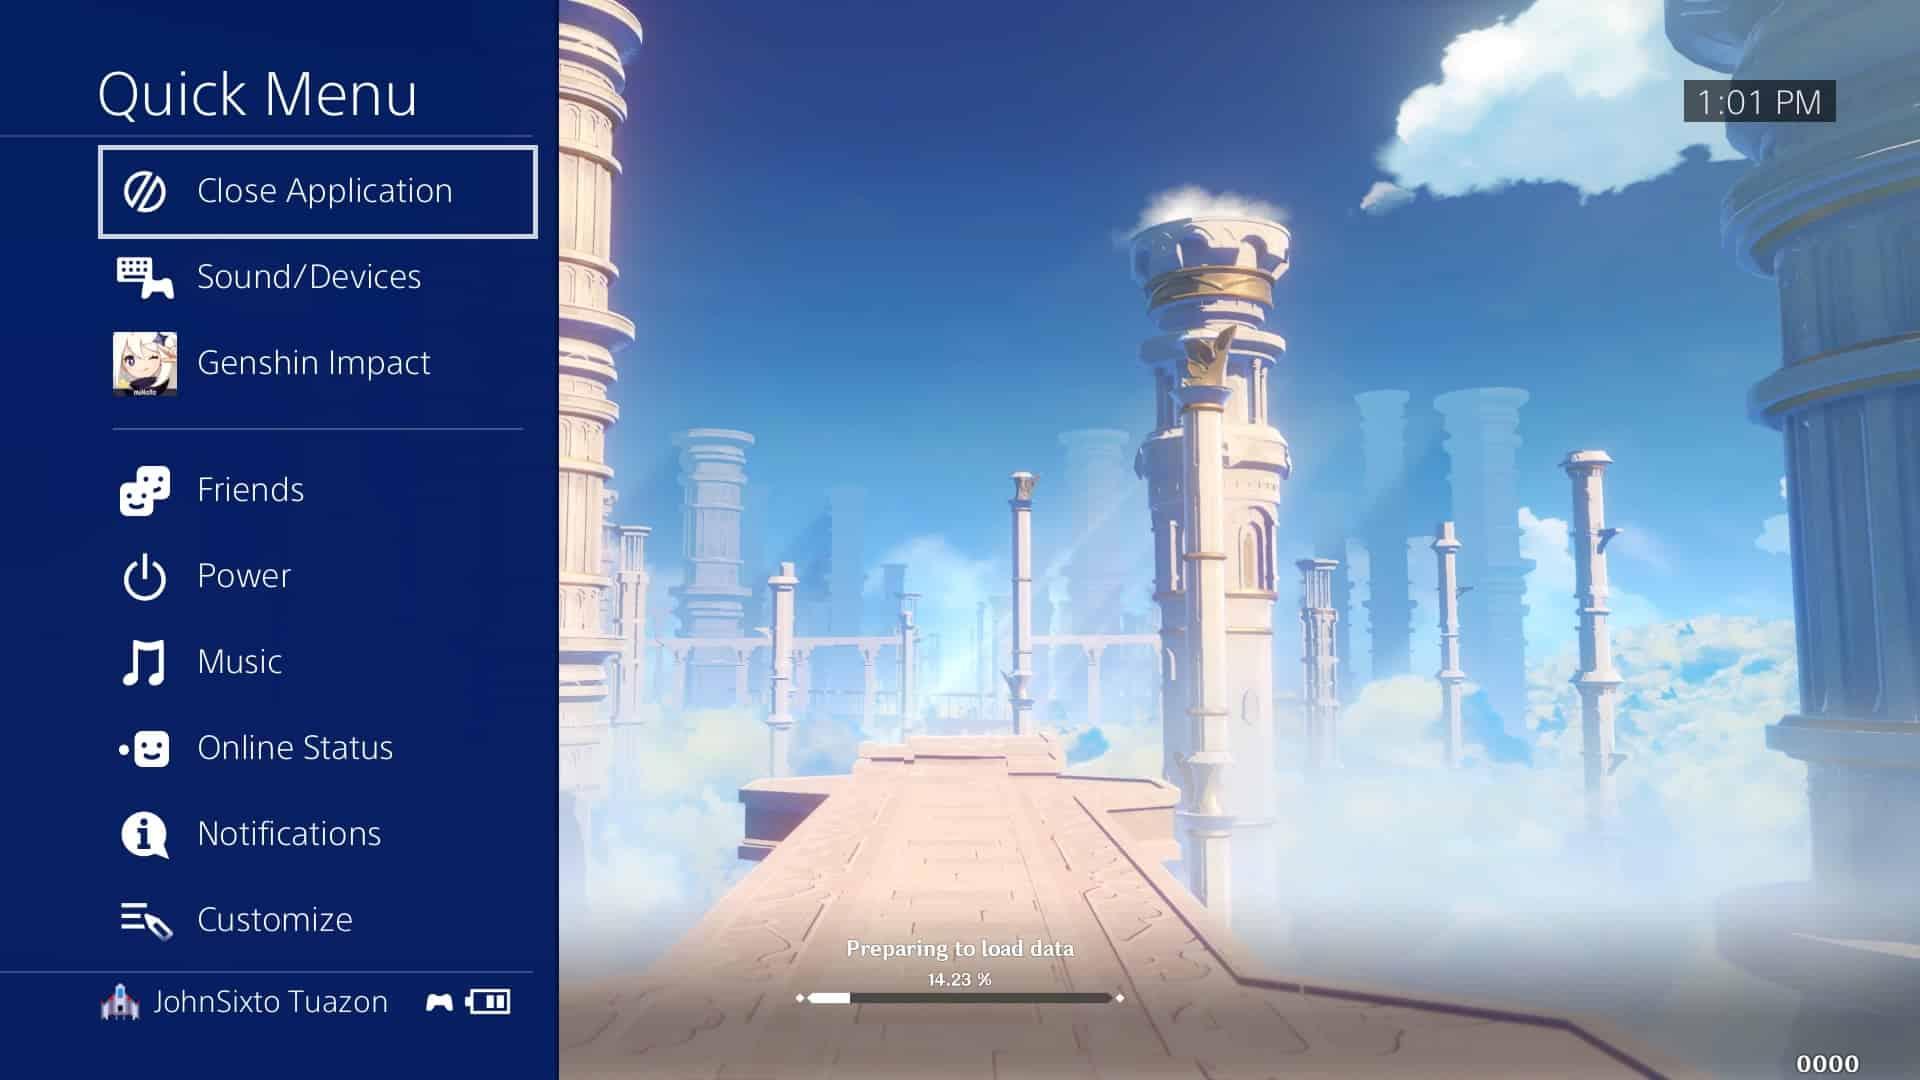 Genshin Impact login failed error on PS4